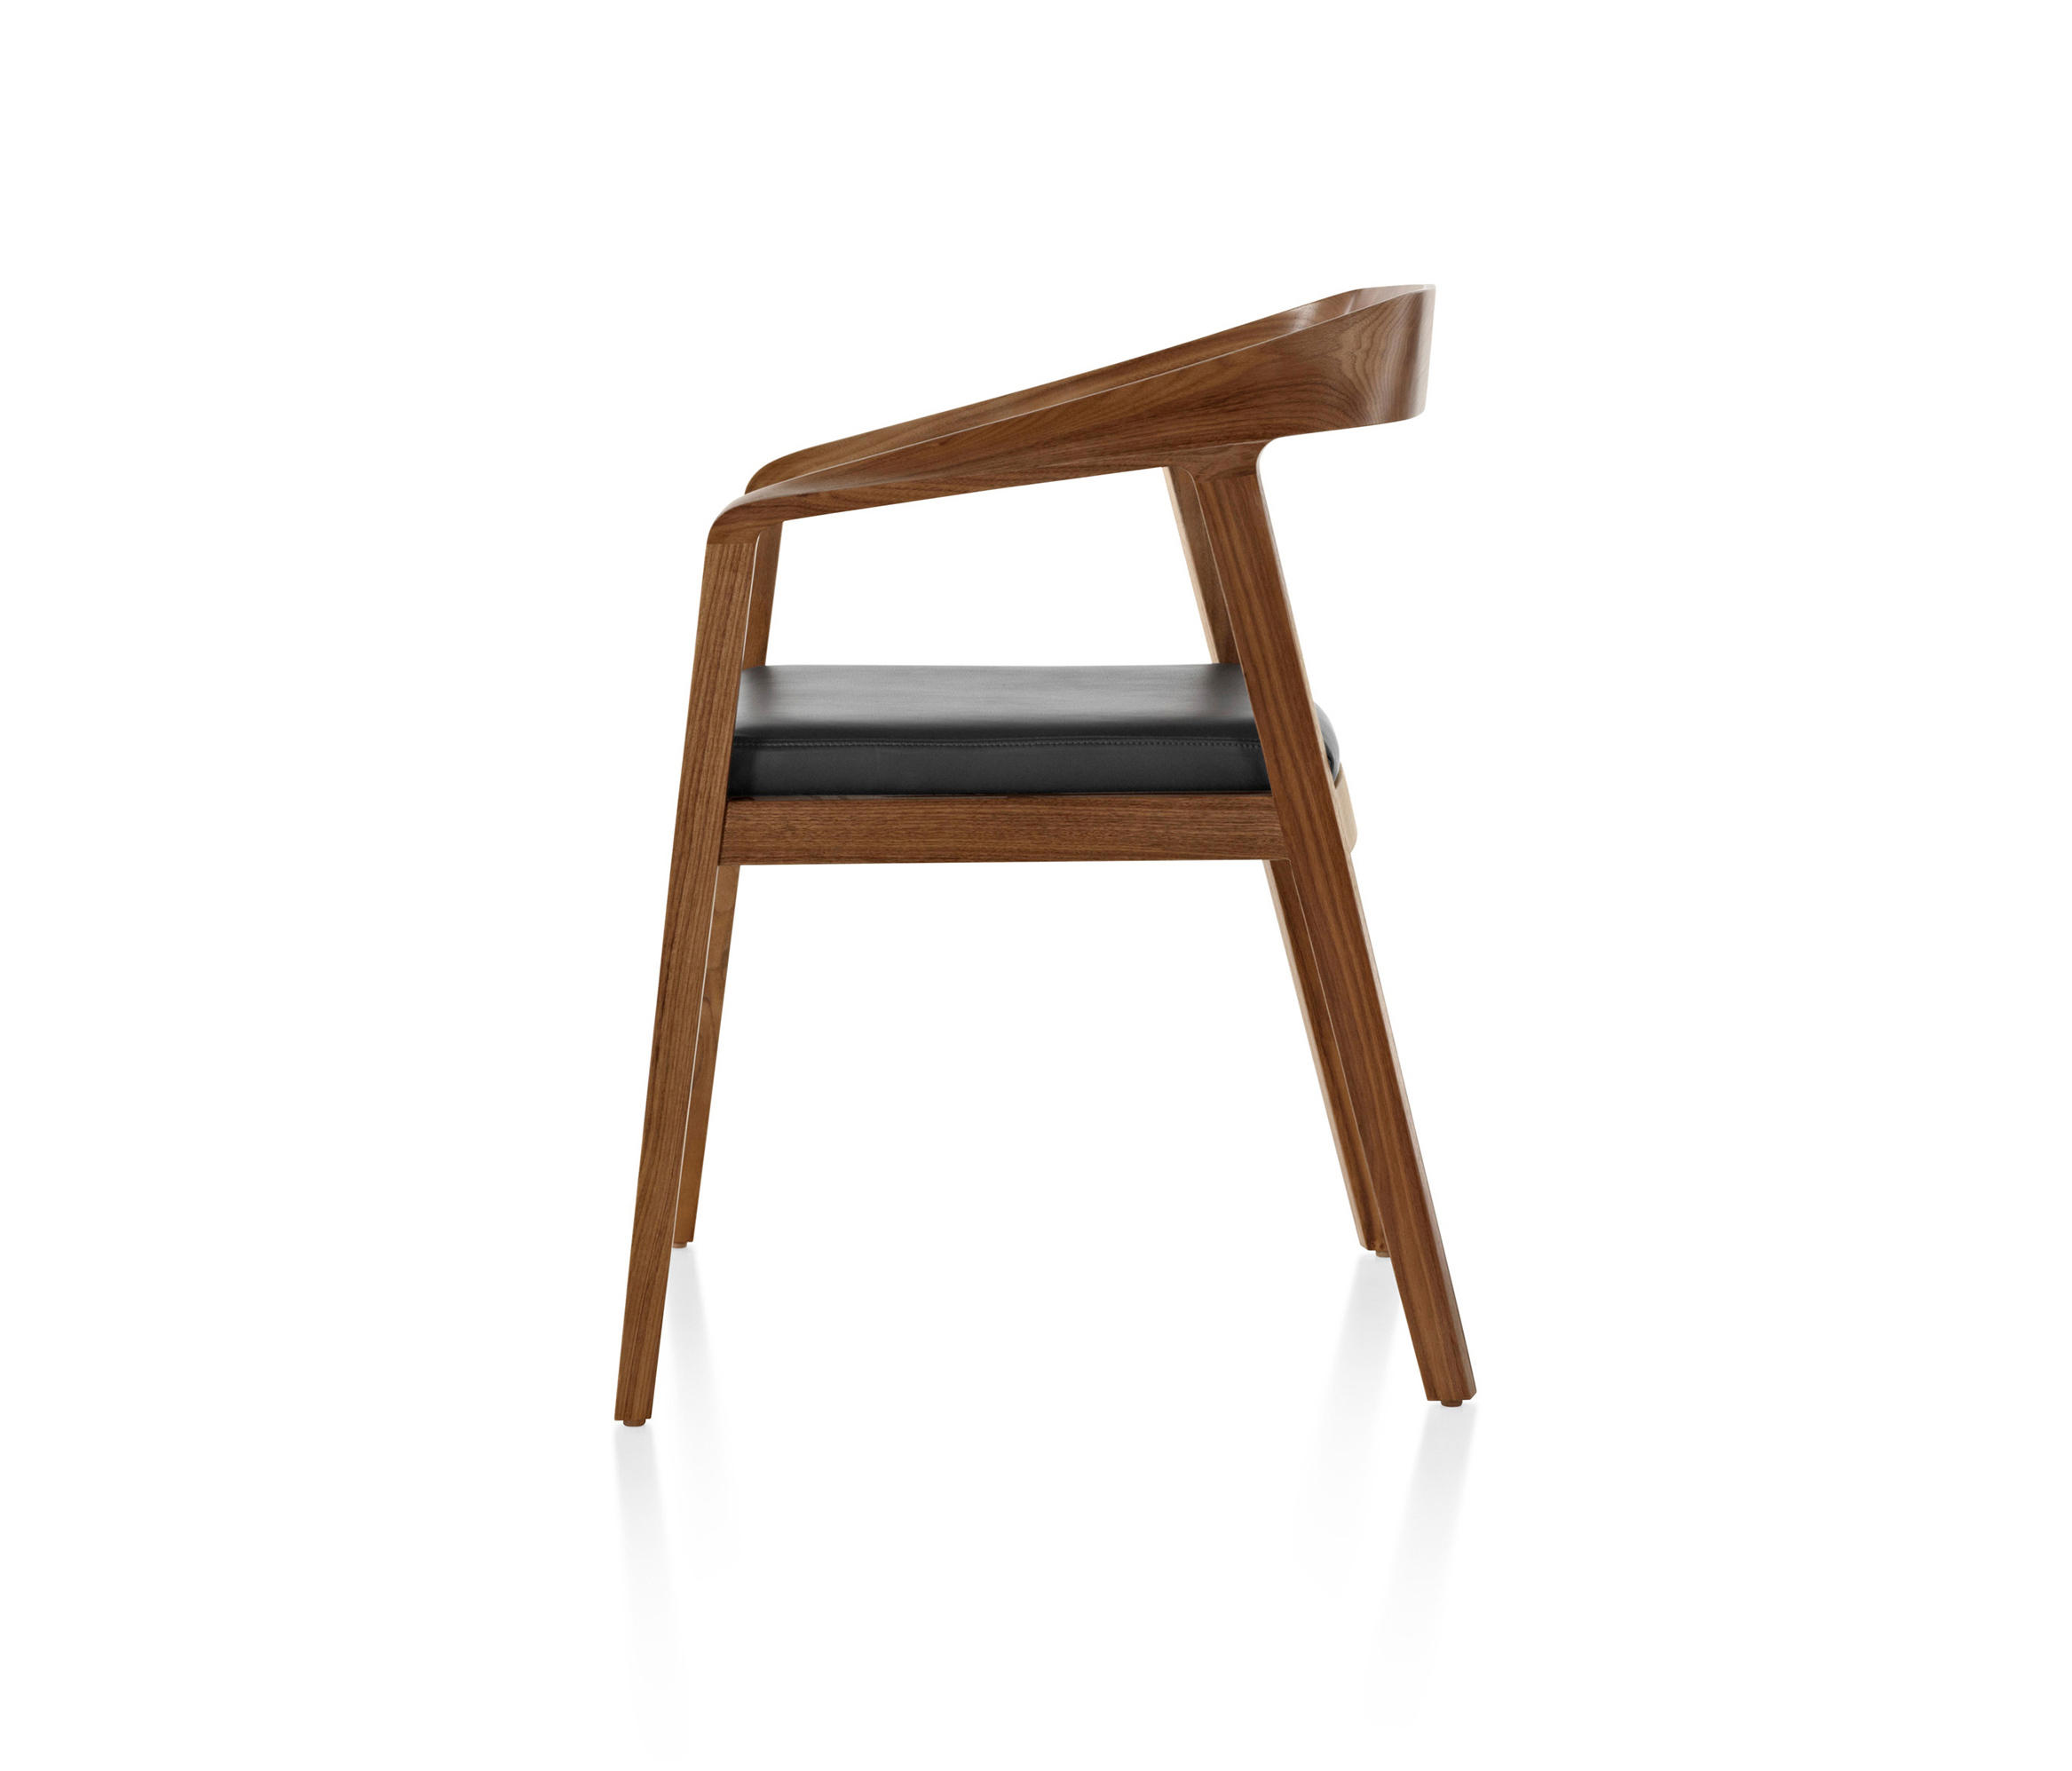 Wondrous Full Twist Chair Designer Furniture Architonic Pdpeps Interior Chair Design Pdpepsorg